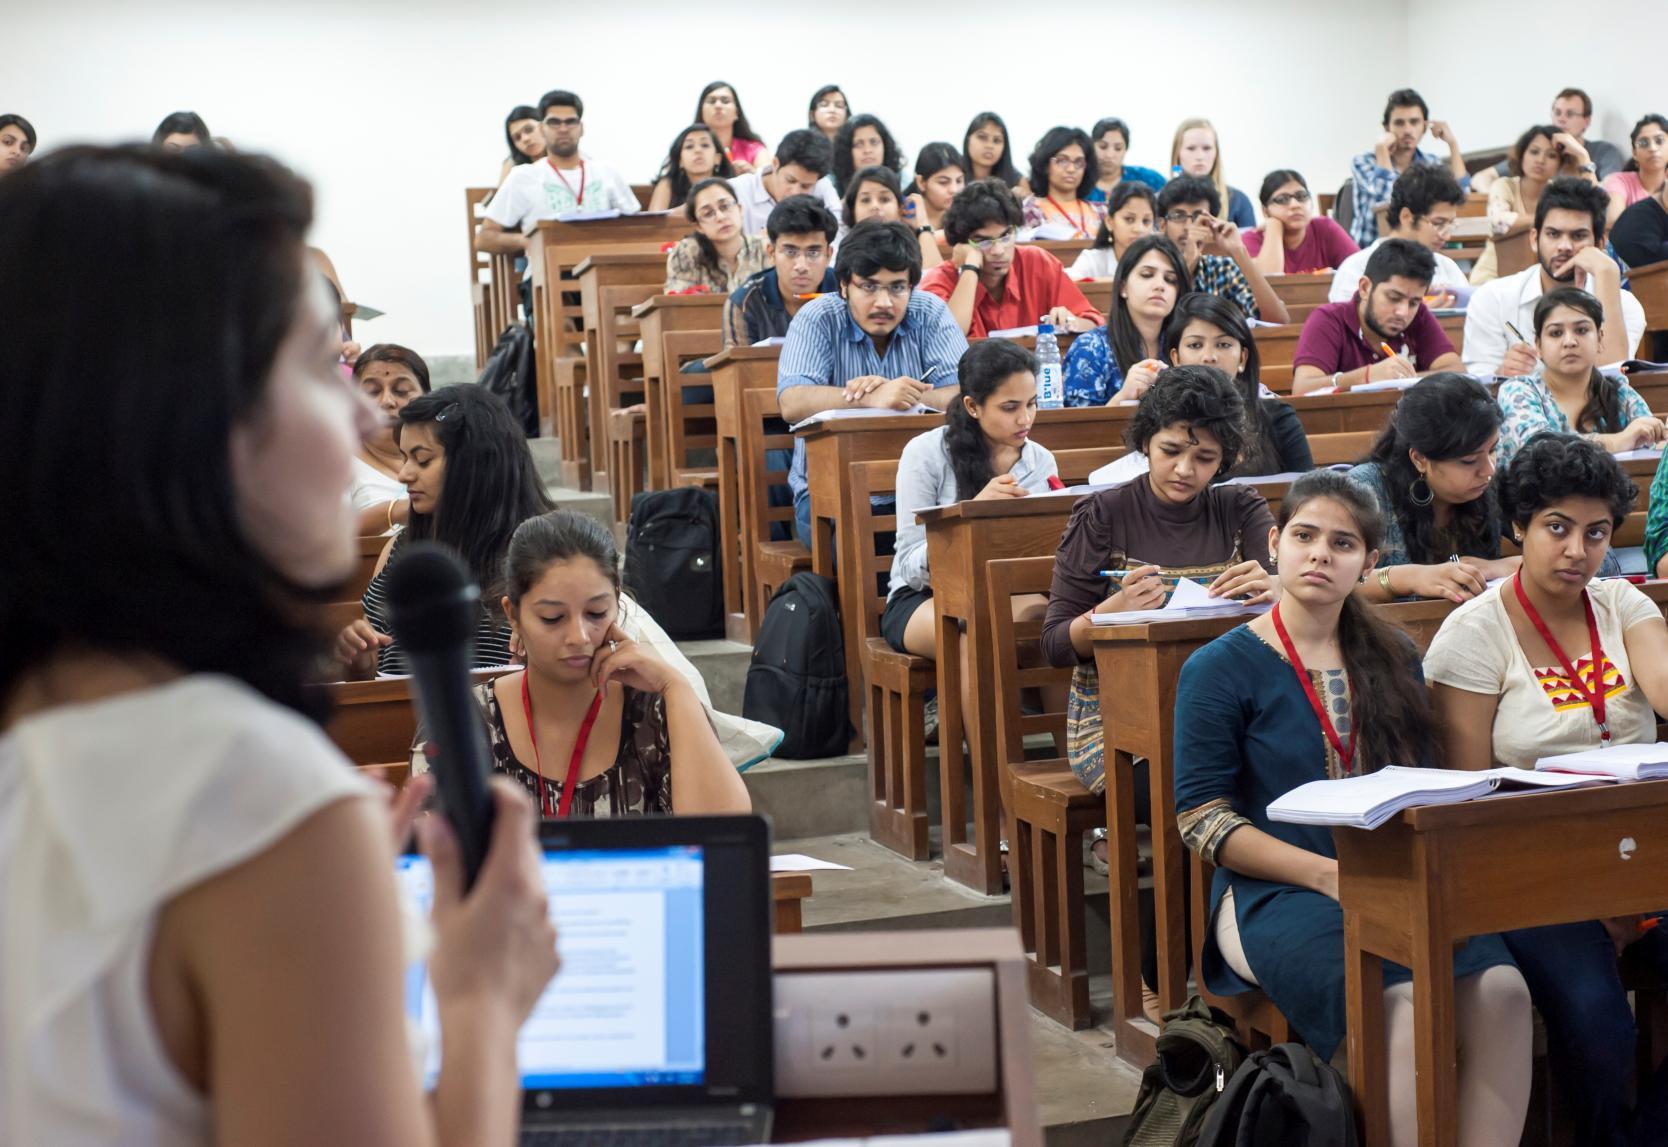 delhi university admission 2019